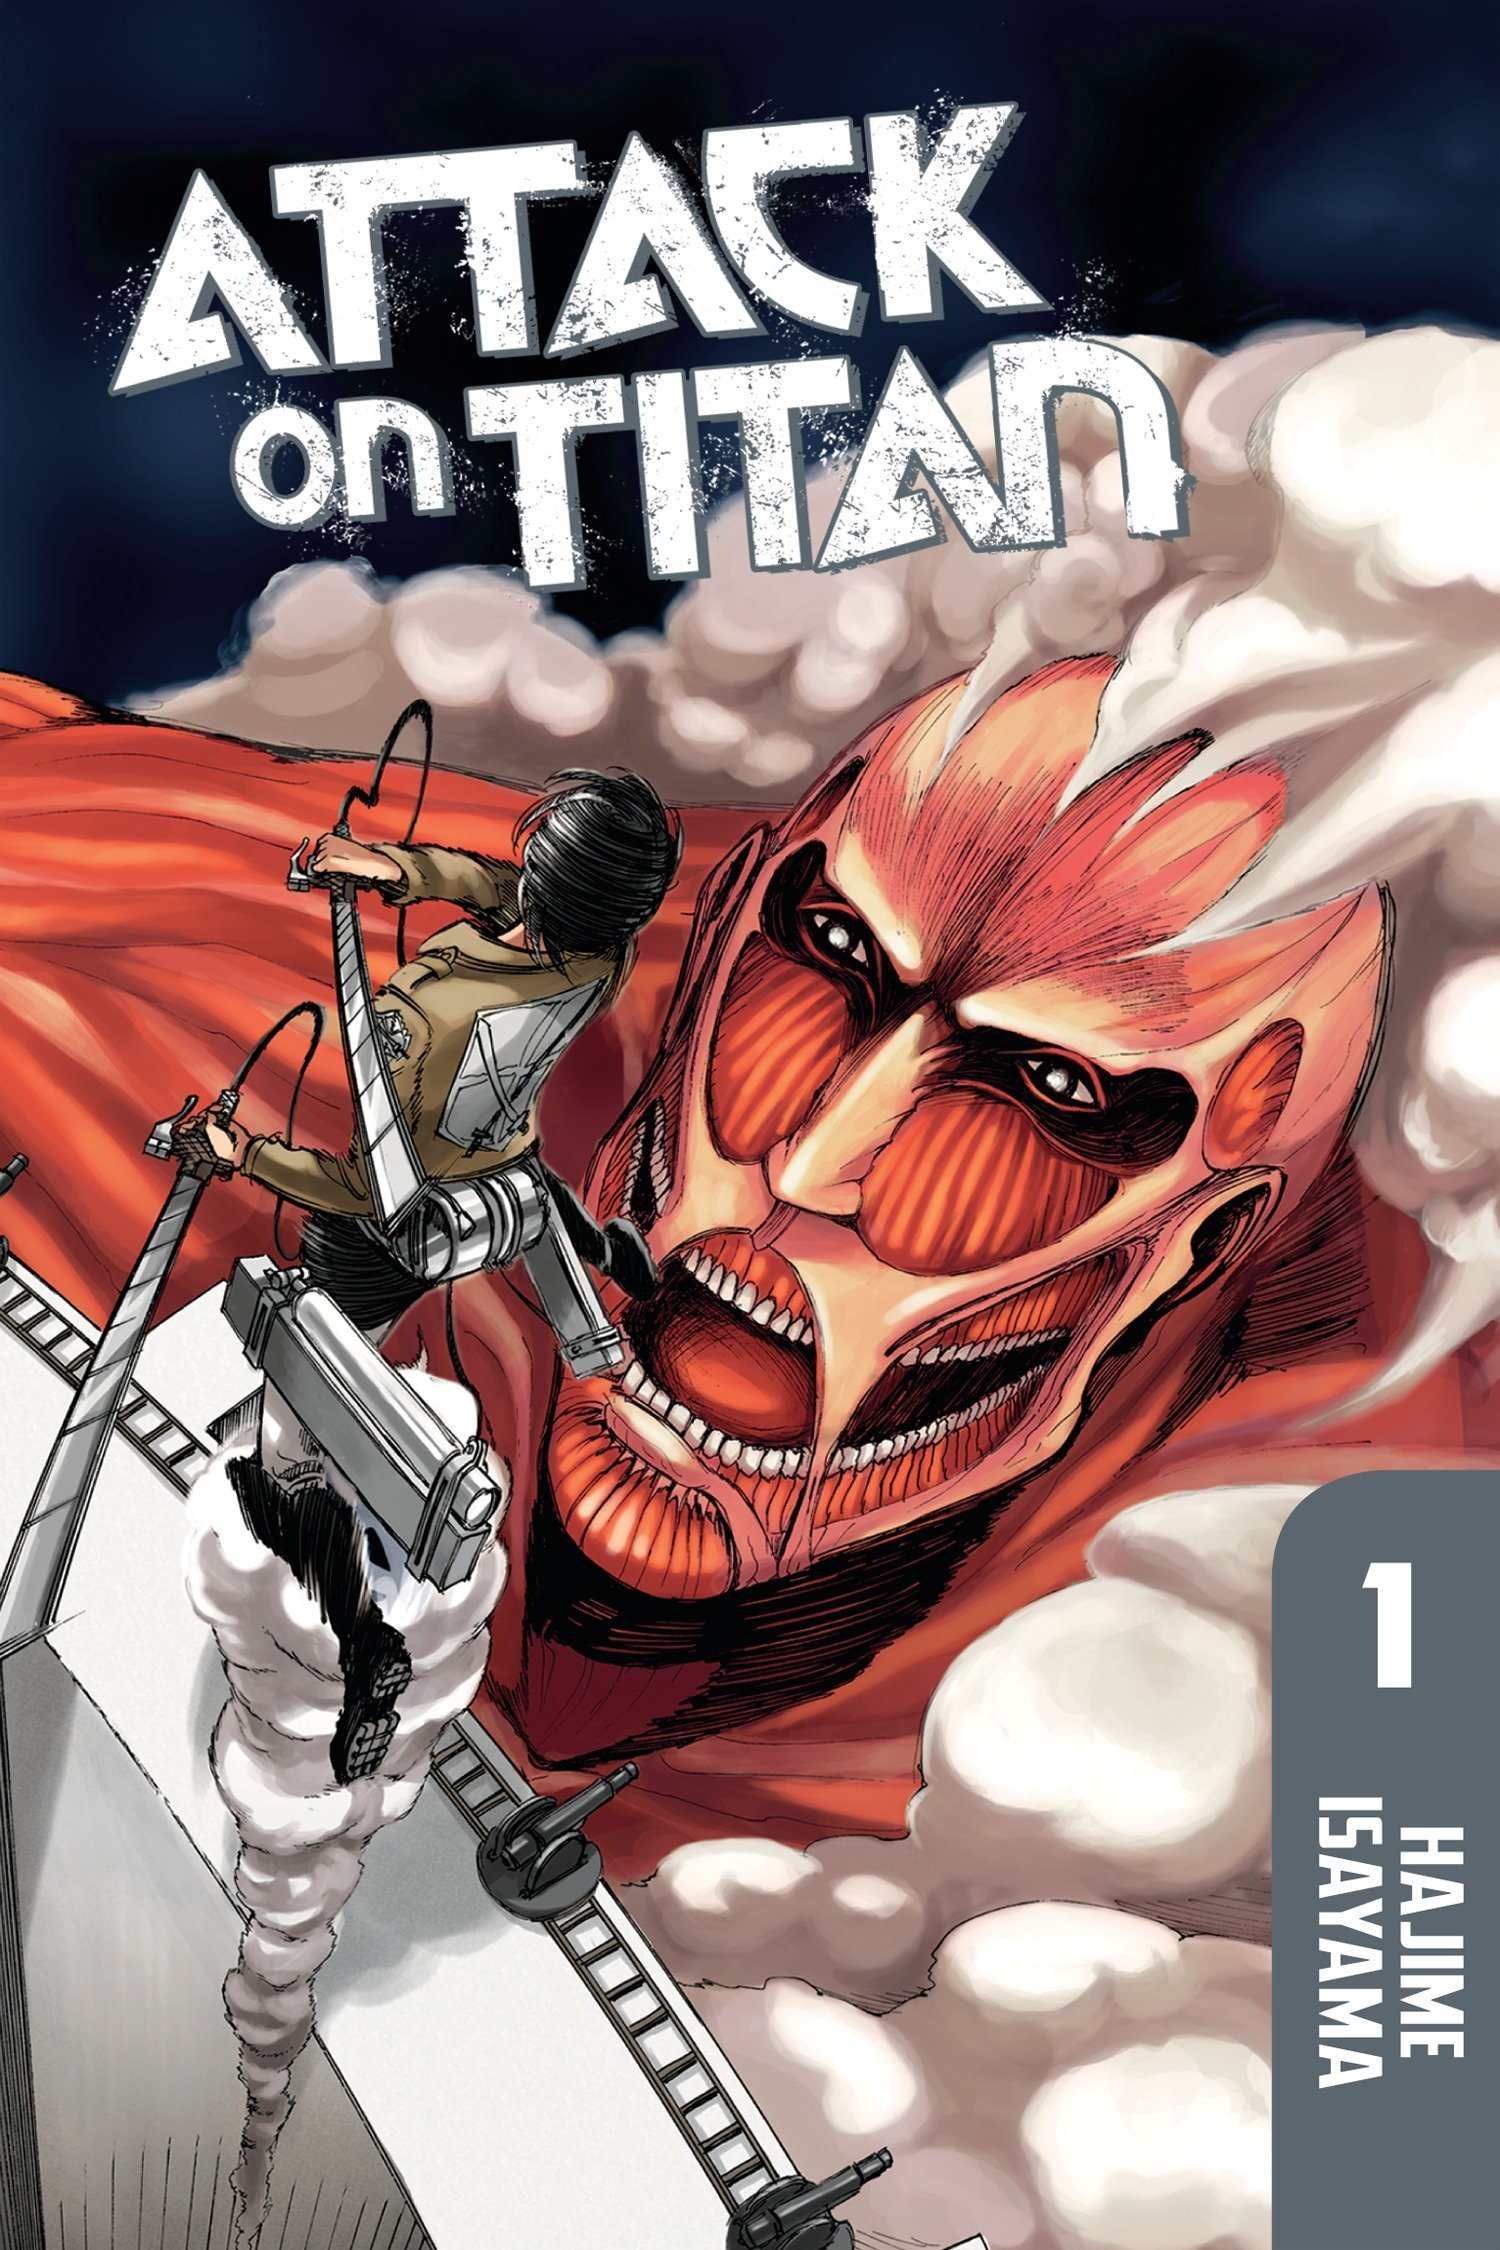 amazon attack on titan 1 hajime isayama science fiction